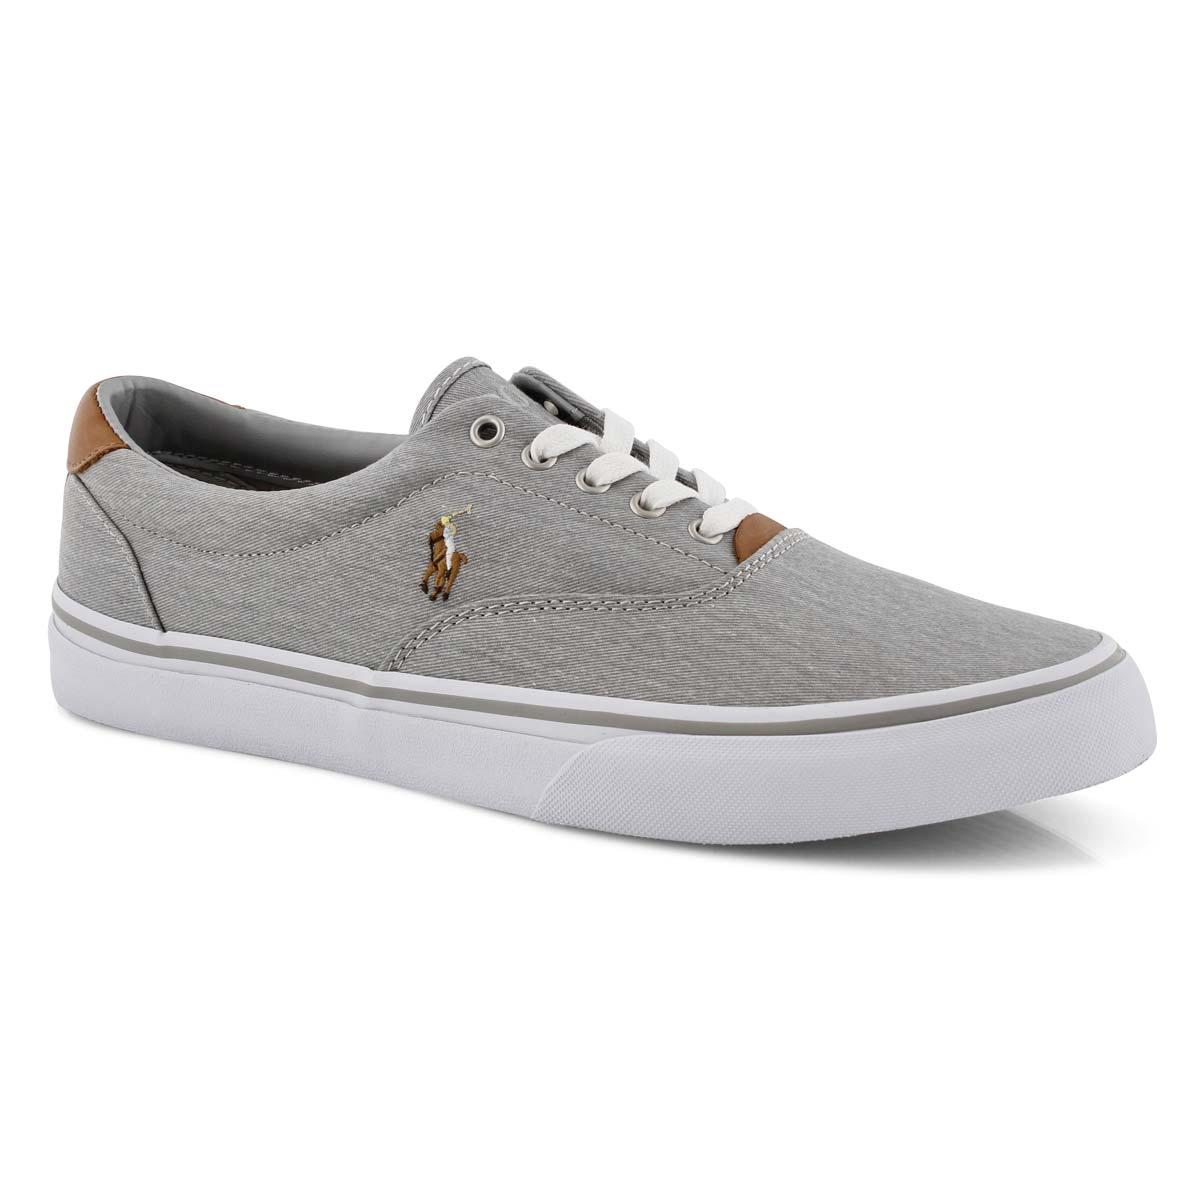 Mns Thorton soft grey lace up sneaker